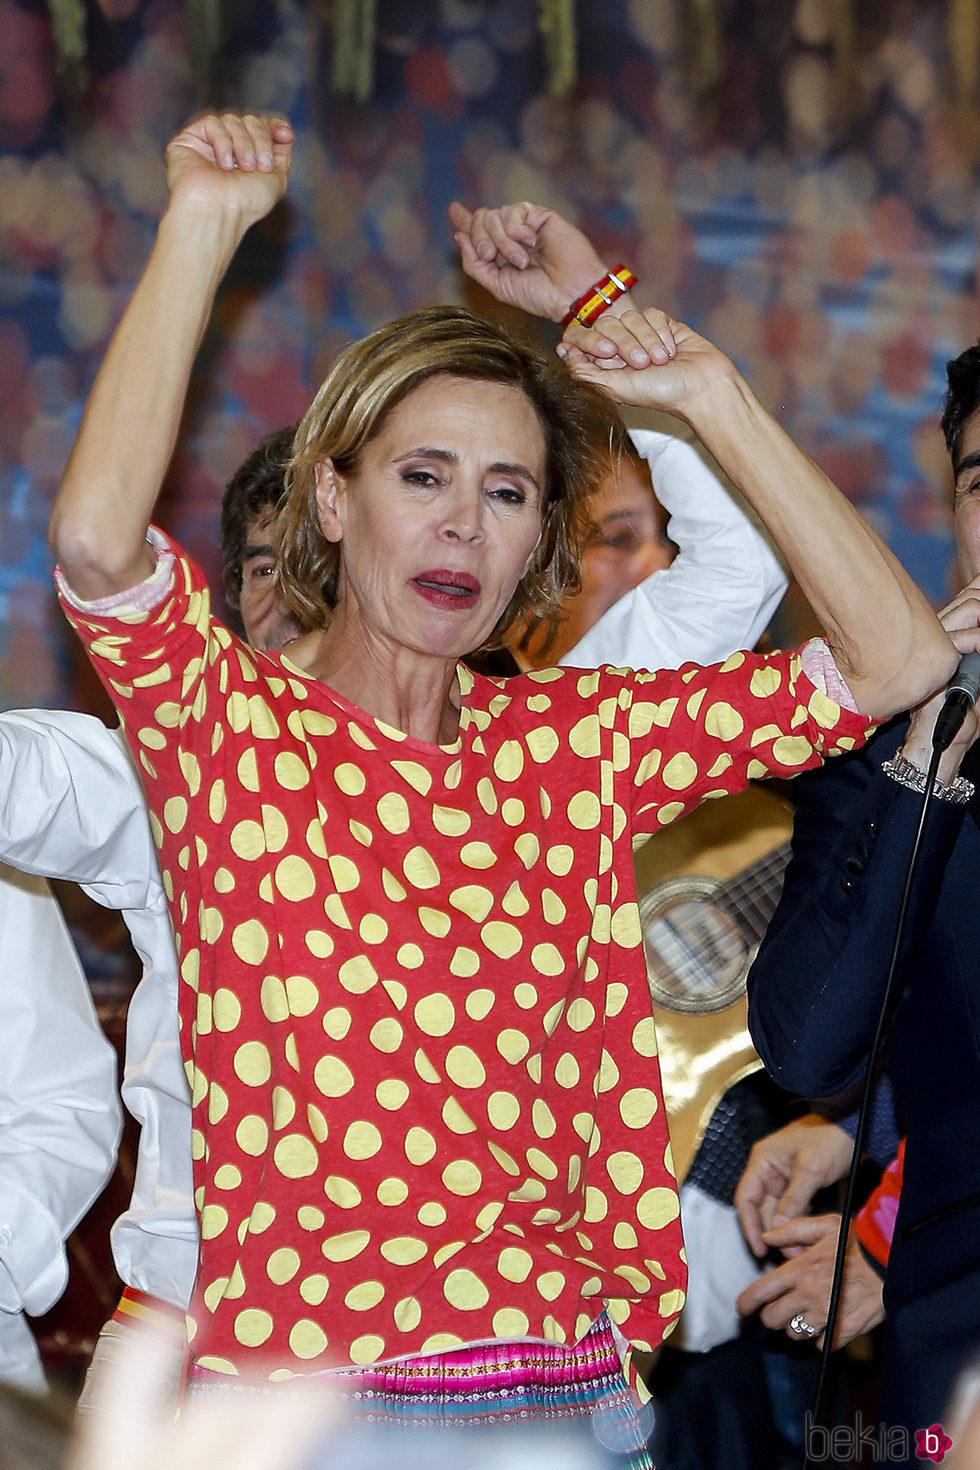 Ágatha Ruiz de la Prada en el Rastrillo Nuevo Futuro